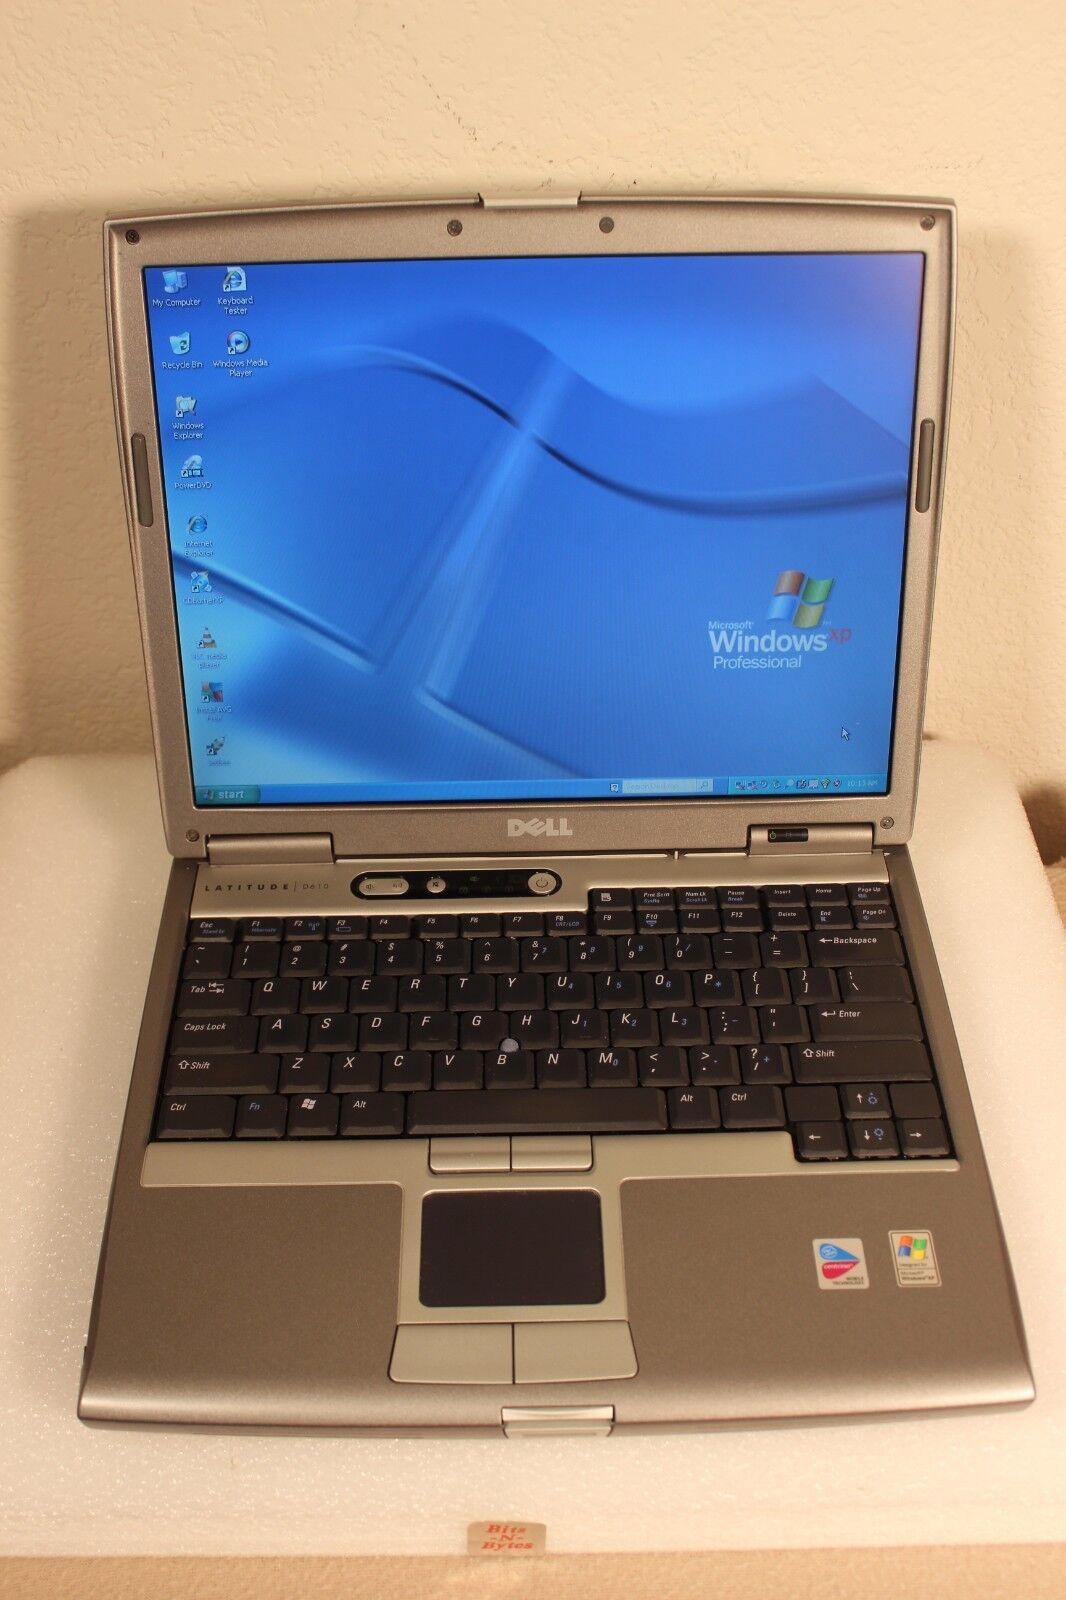 Dell Latitude D610 Notebook (1.73GHz/1.0GB/40GB/CDRW-DVD) Windows XP PRO